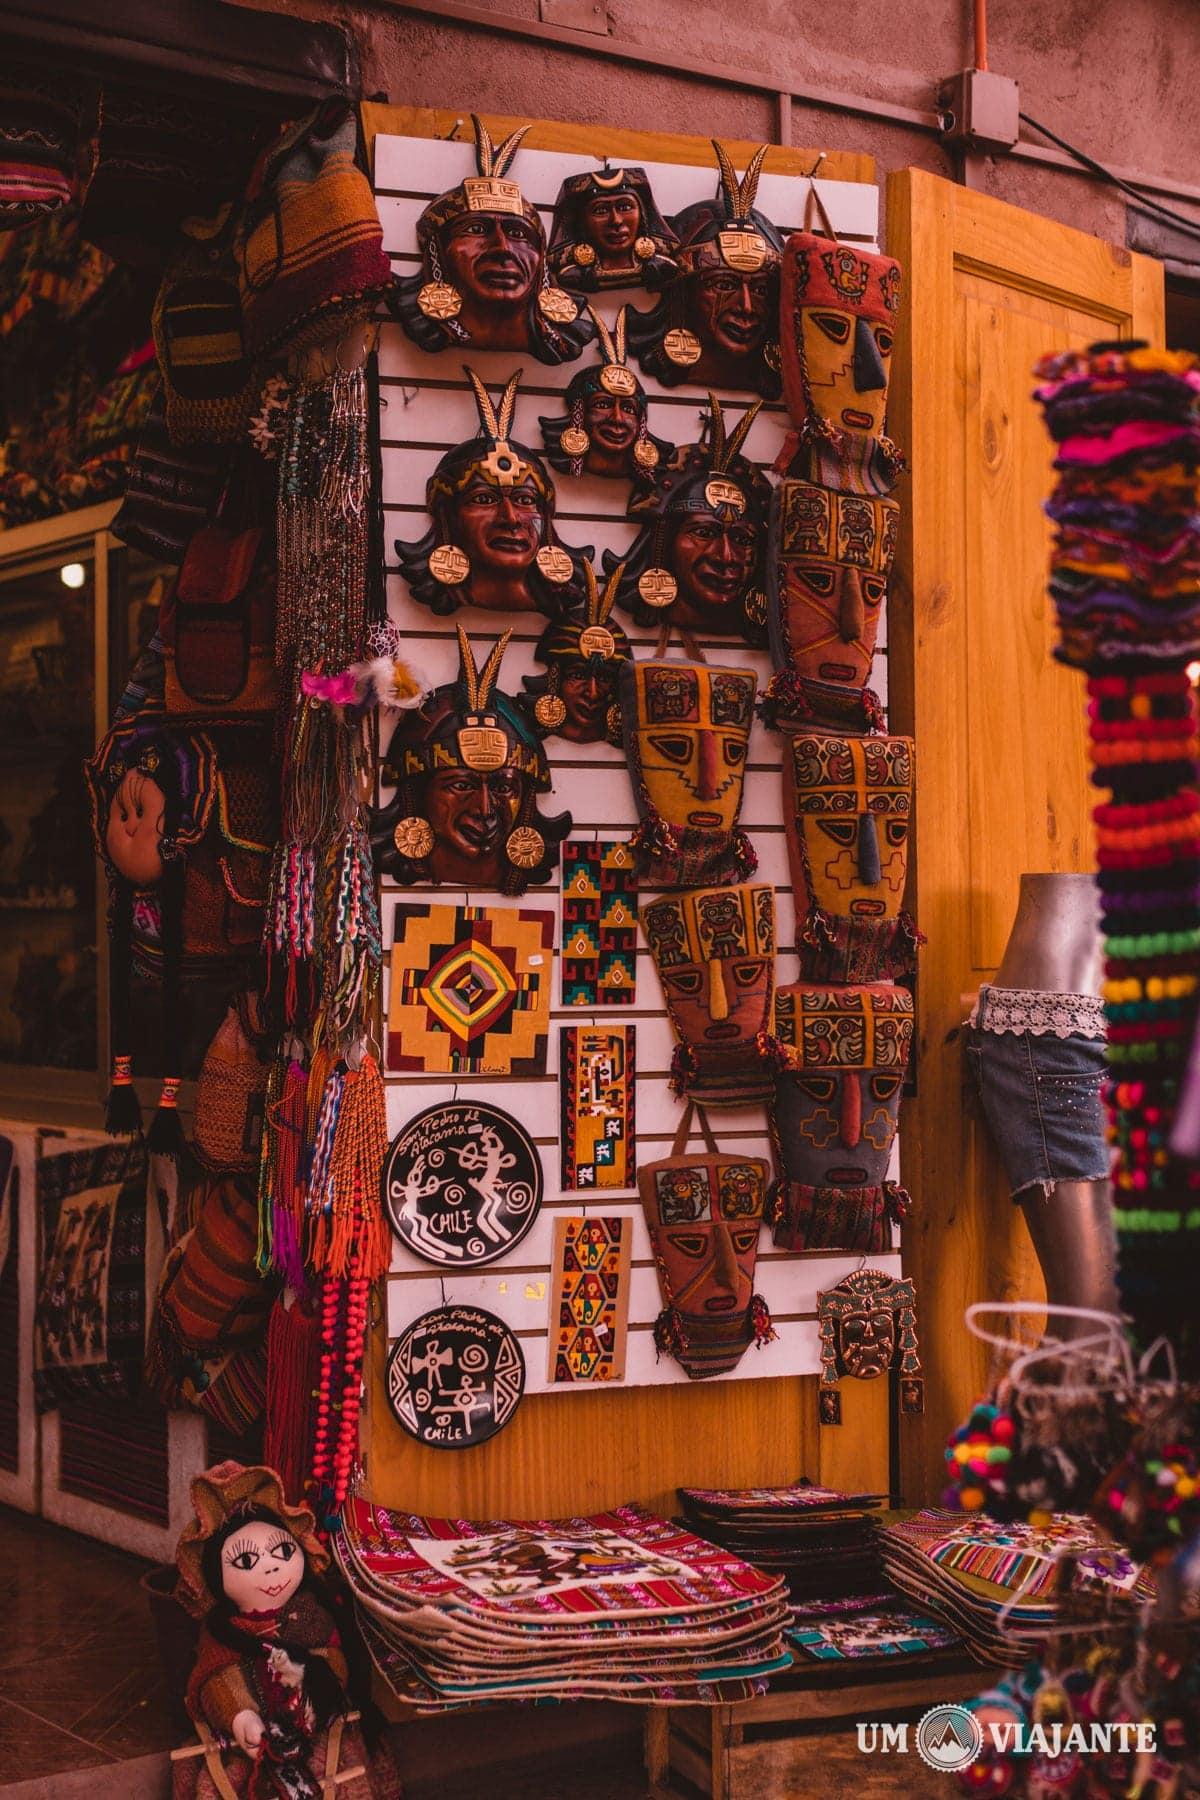 Comprar lhamas no Atacama